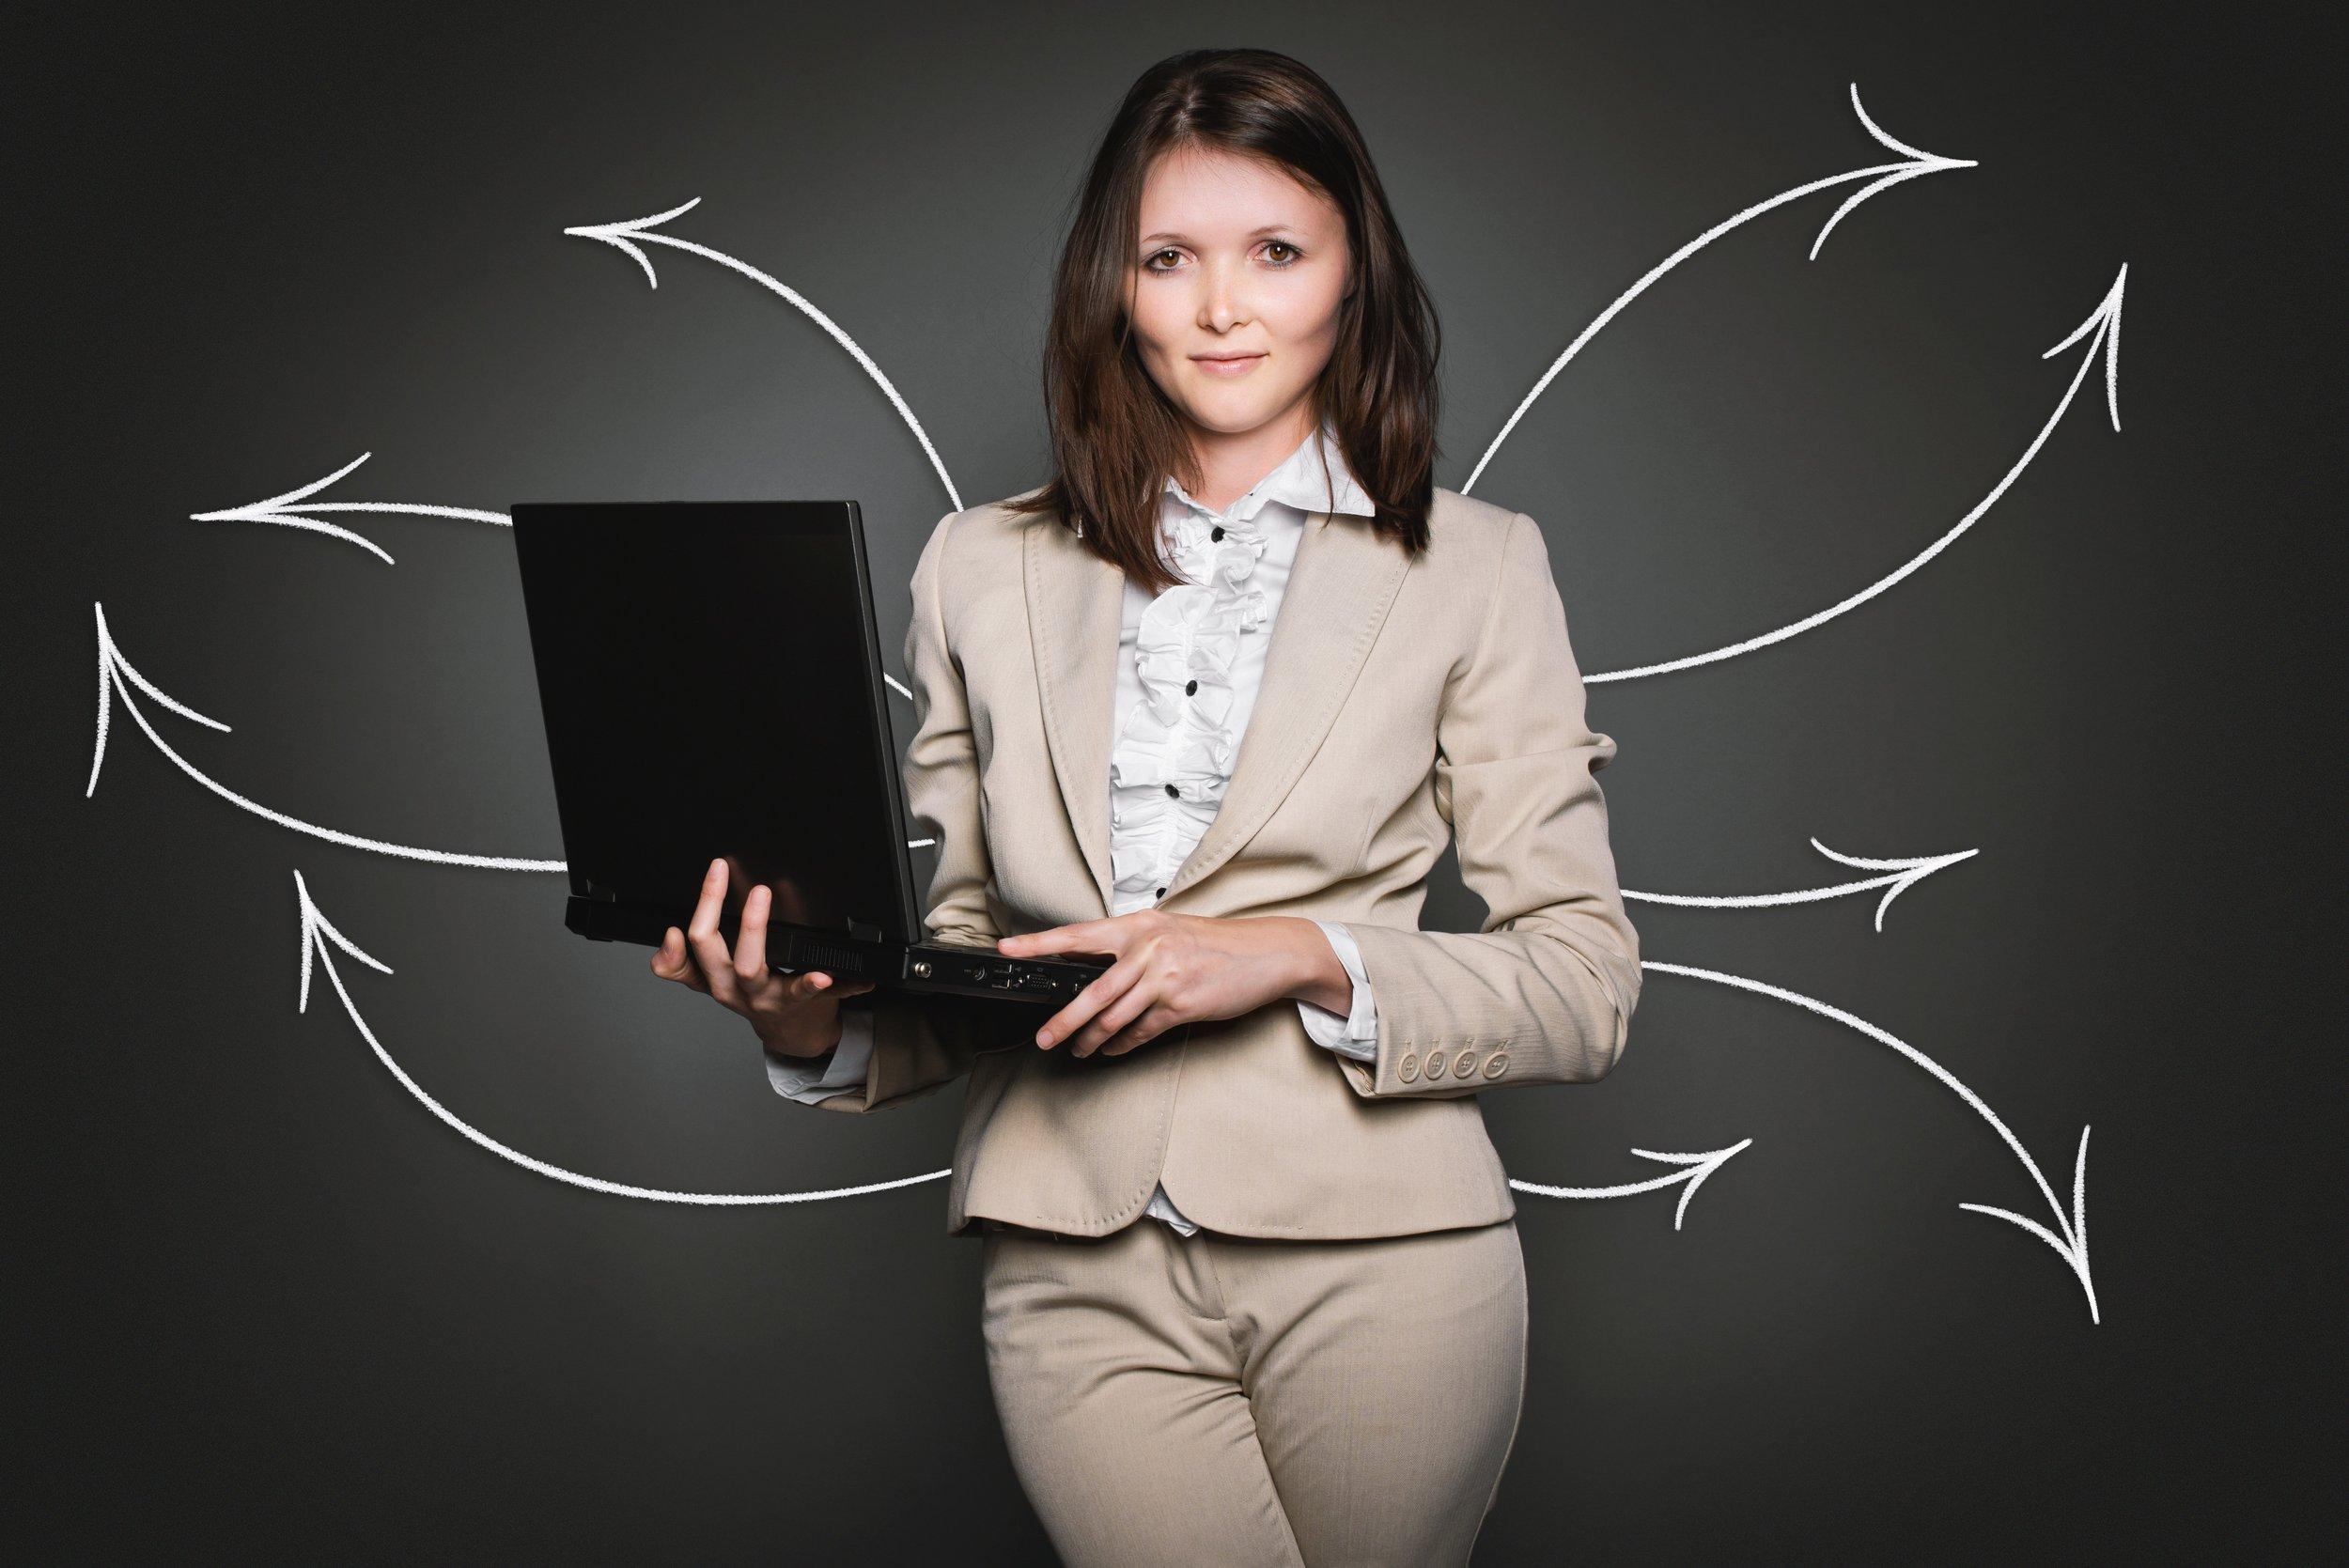 Social media and streamlining options